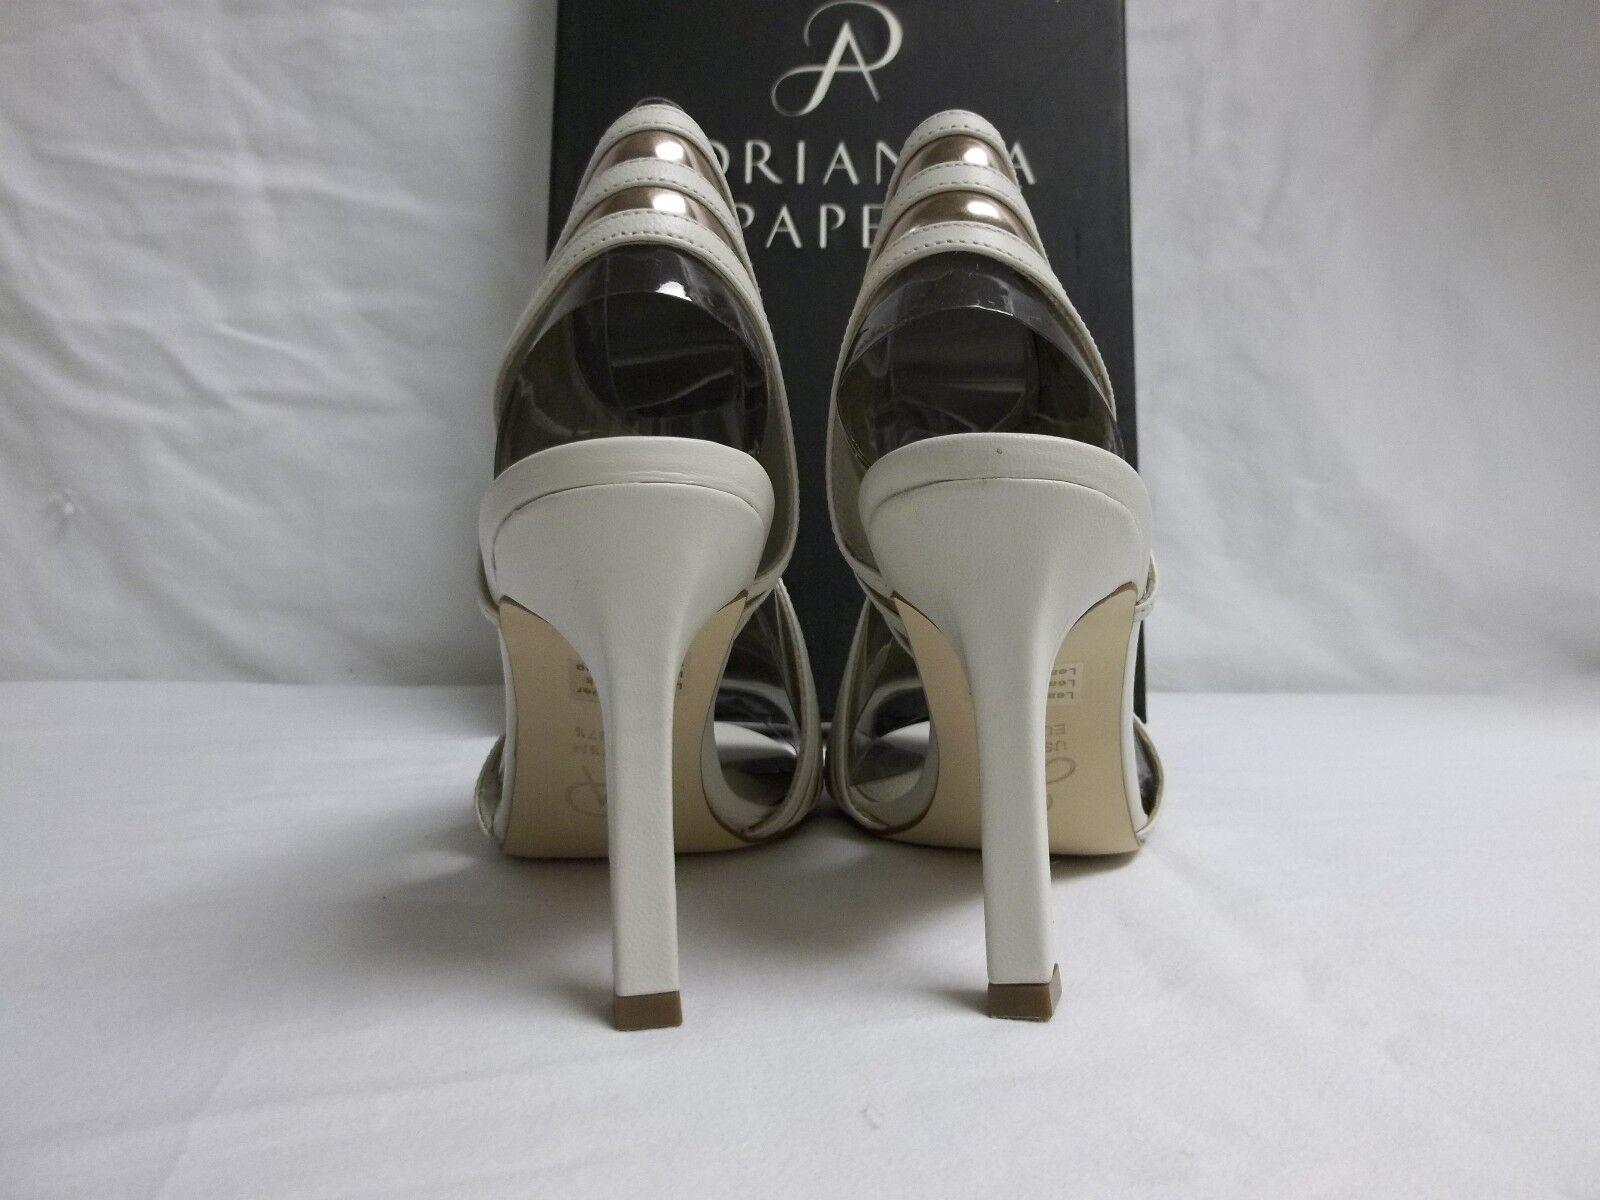 Adrianna Papell Sz 8 M Edison Vanilla Leder Open Toe Heels NEU Damenschuhe Schuhes